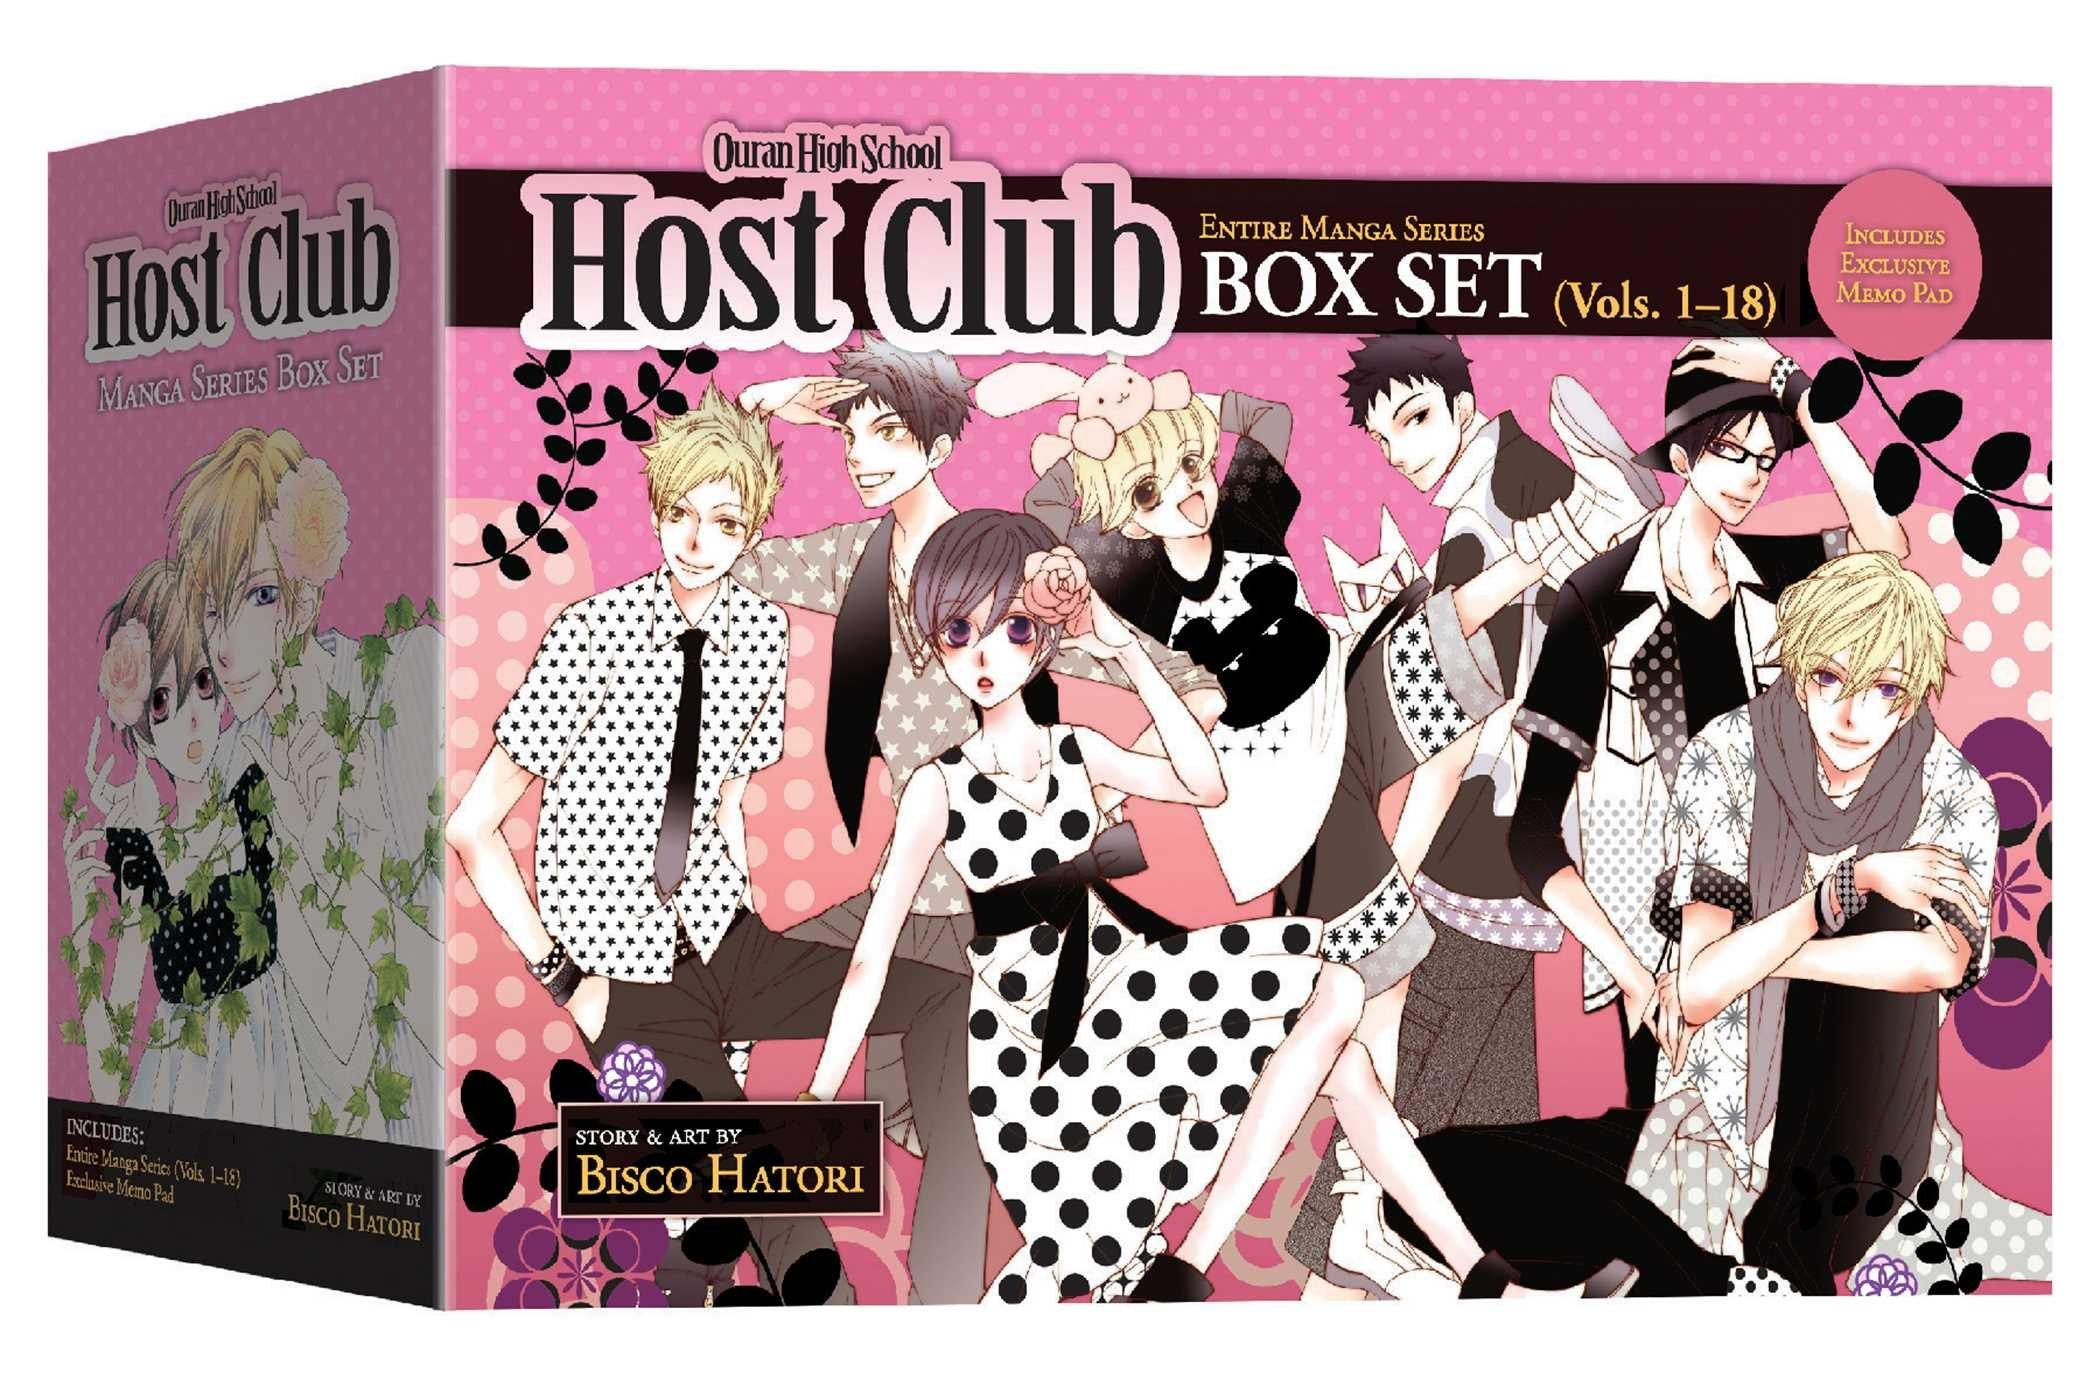 Ouran High School Host Club Box Set (Vol. 1-18) WeeklyReviewer